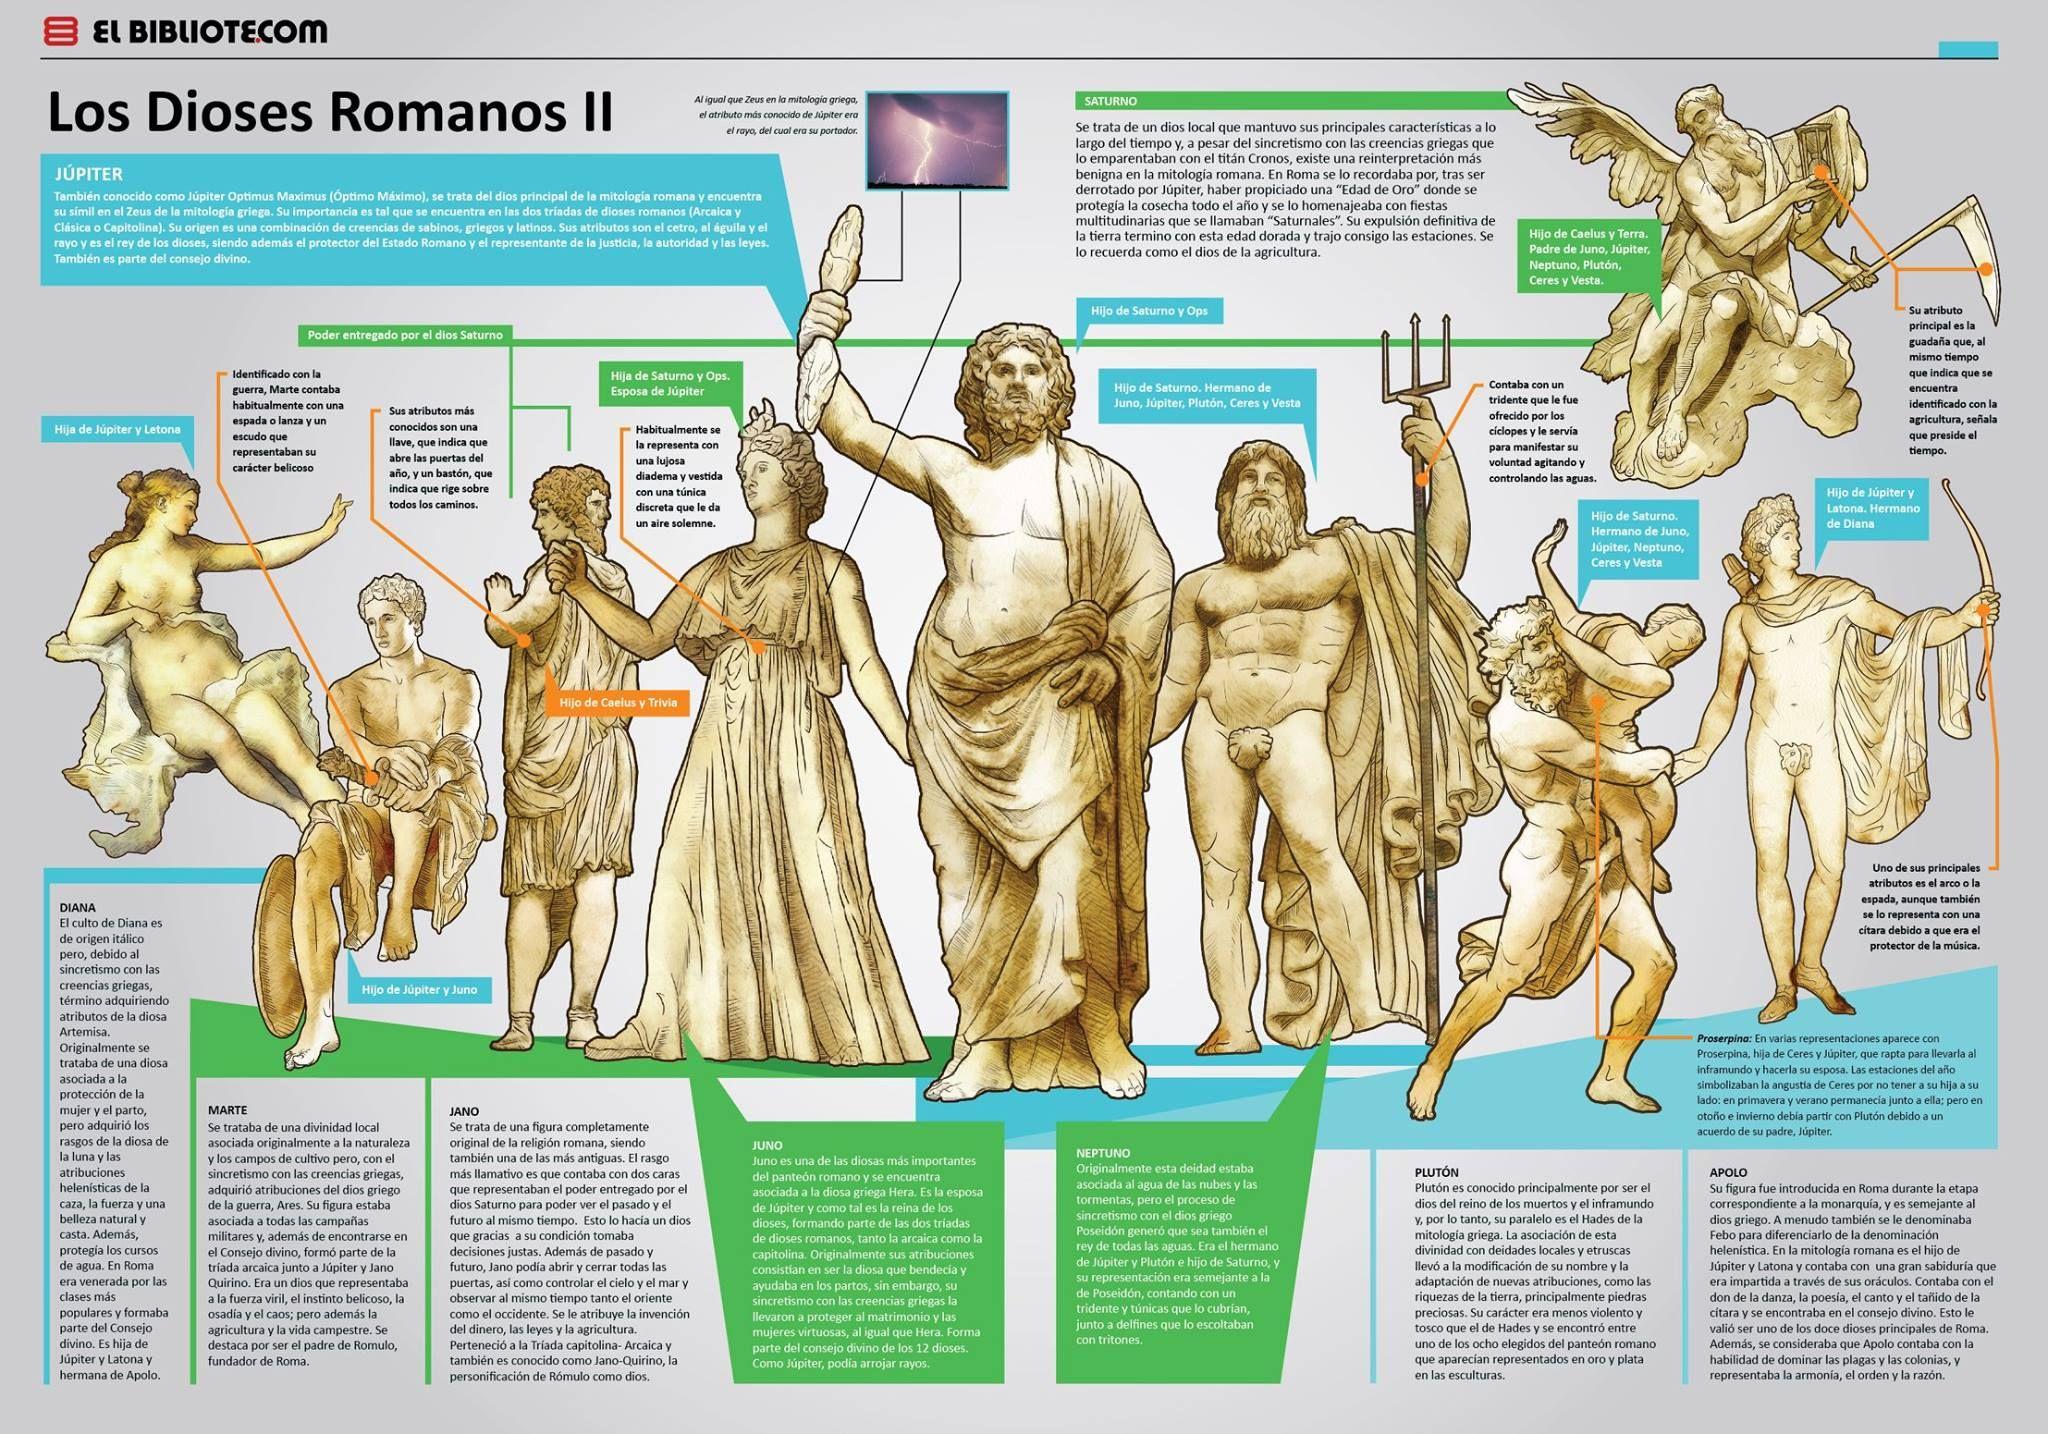 dioses romanos.jpg (2048×1434)